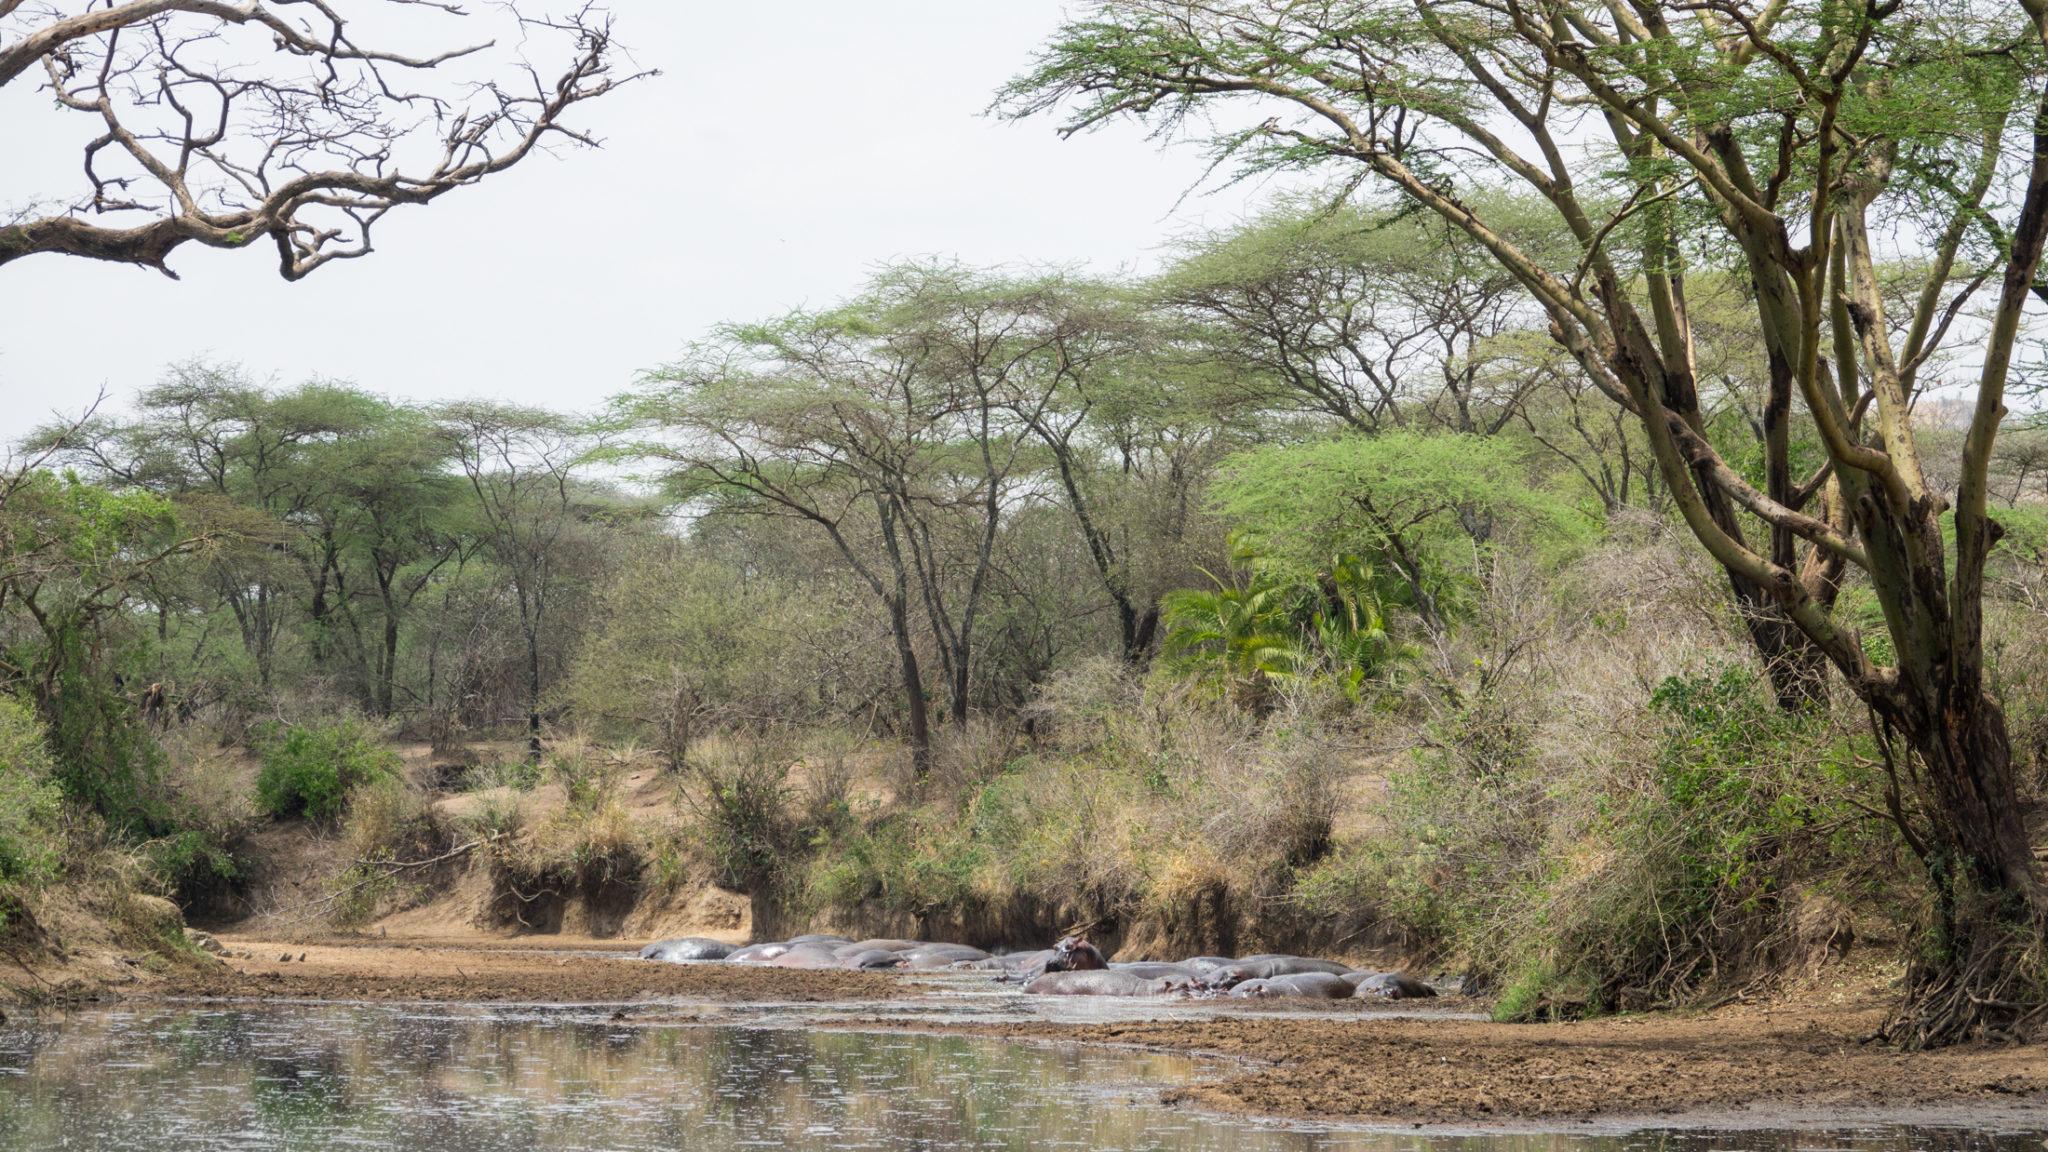 Hippos im Fluss in der Serengeti, Tansania